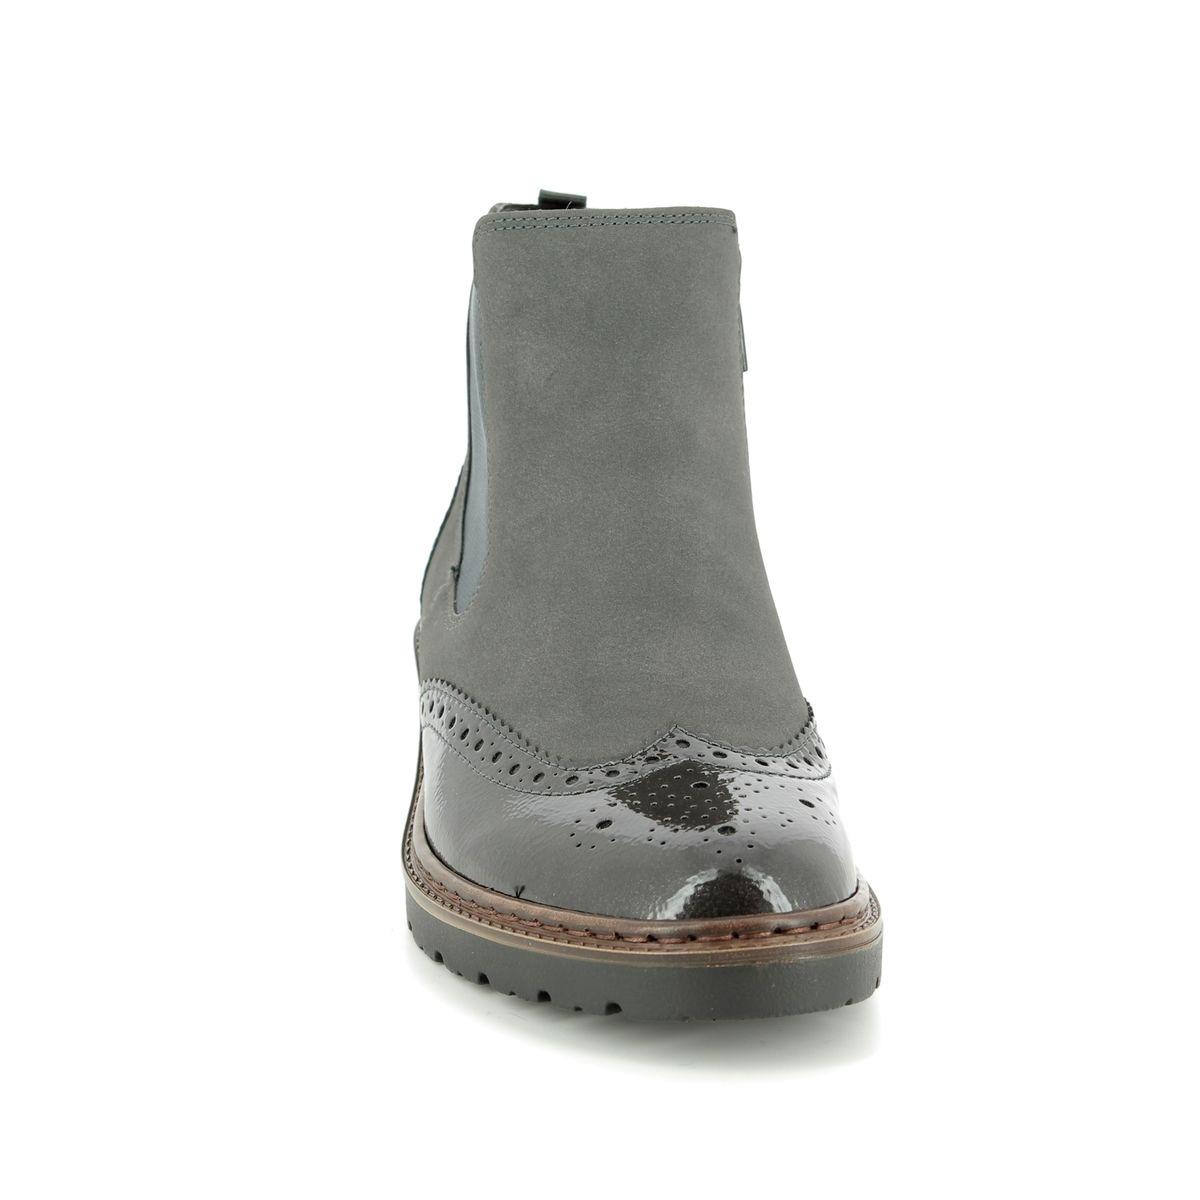 b0b6e83f690 Ara Chelsea Boots - Grey patent - 60004/75 PORTLAND BROGU